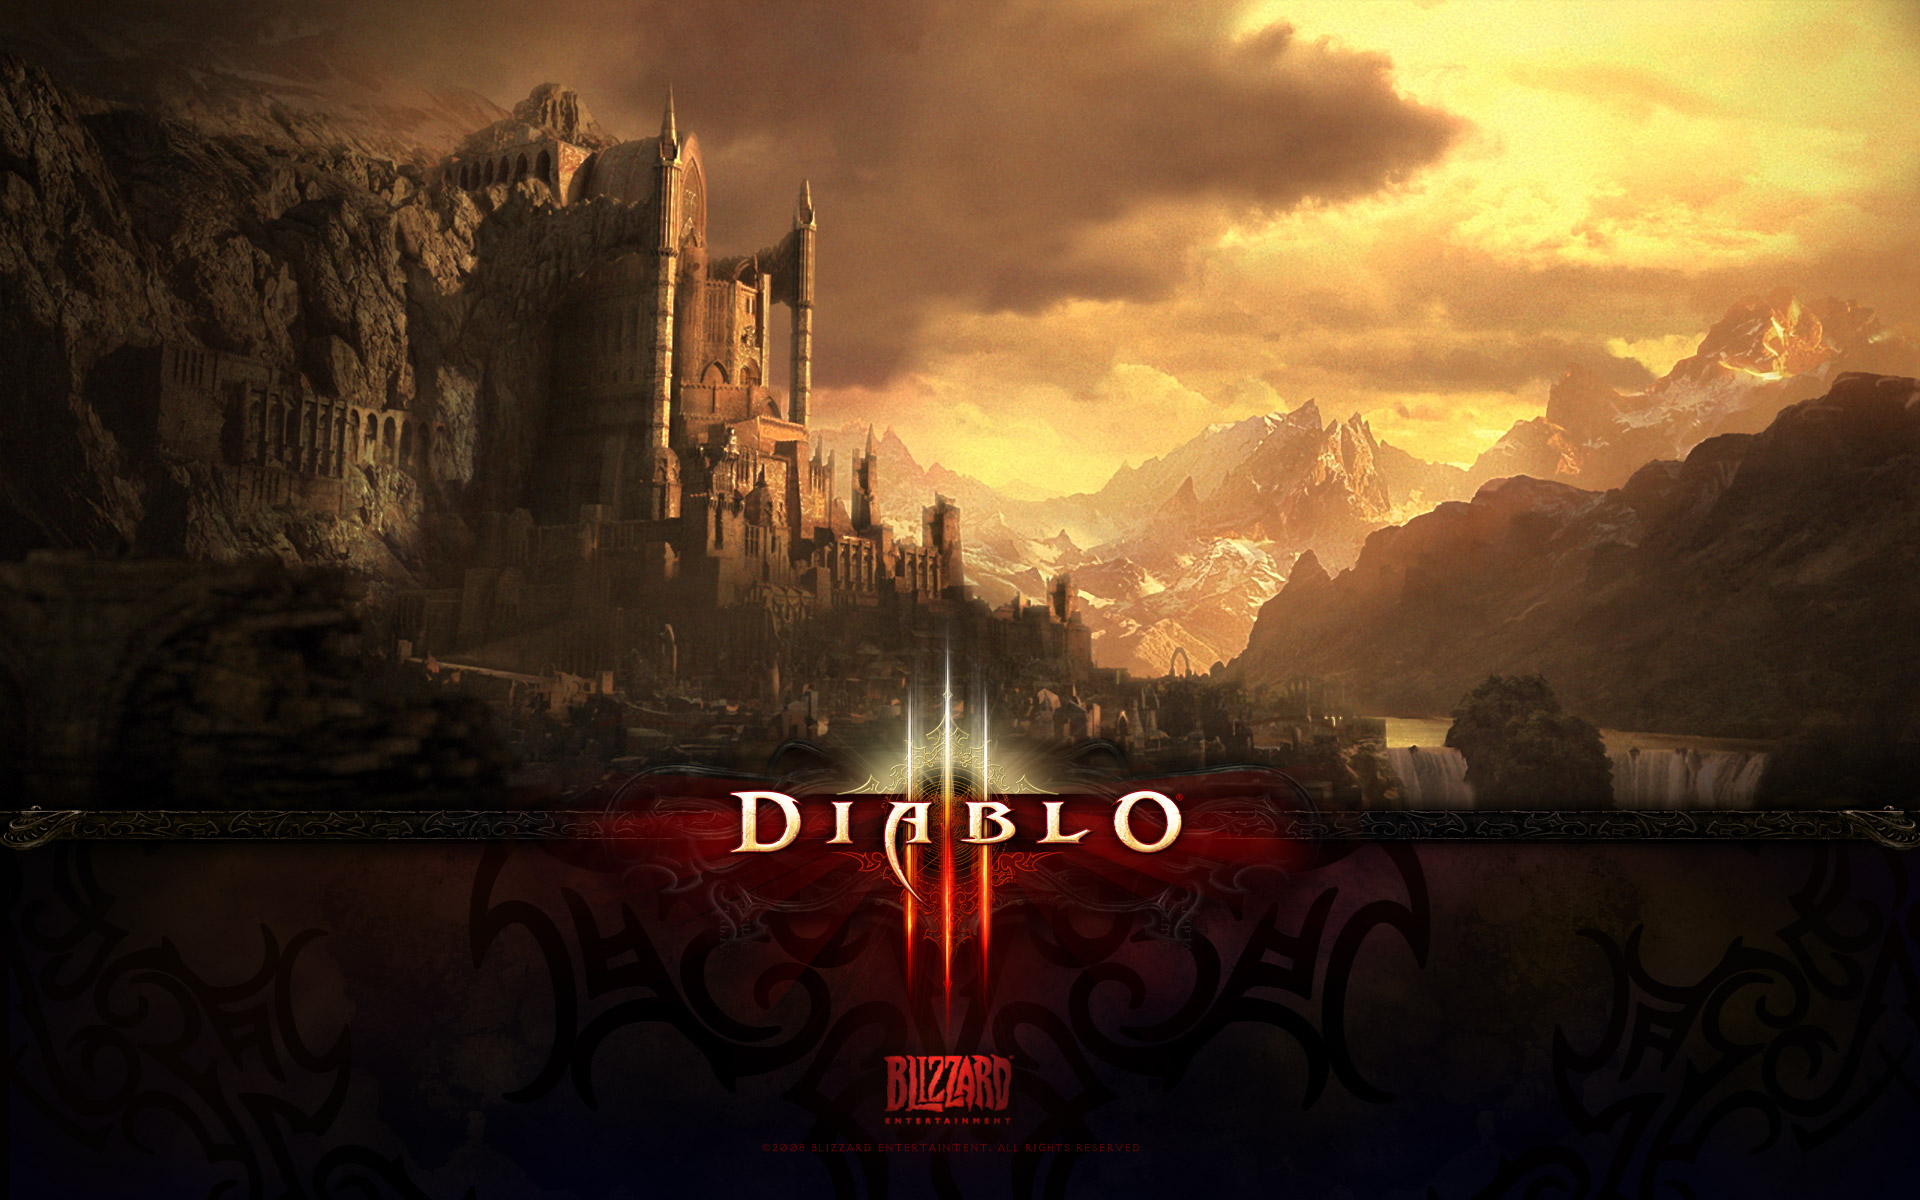 Diablo 3 wallpaper 17